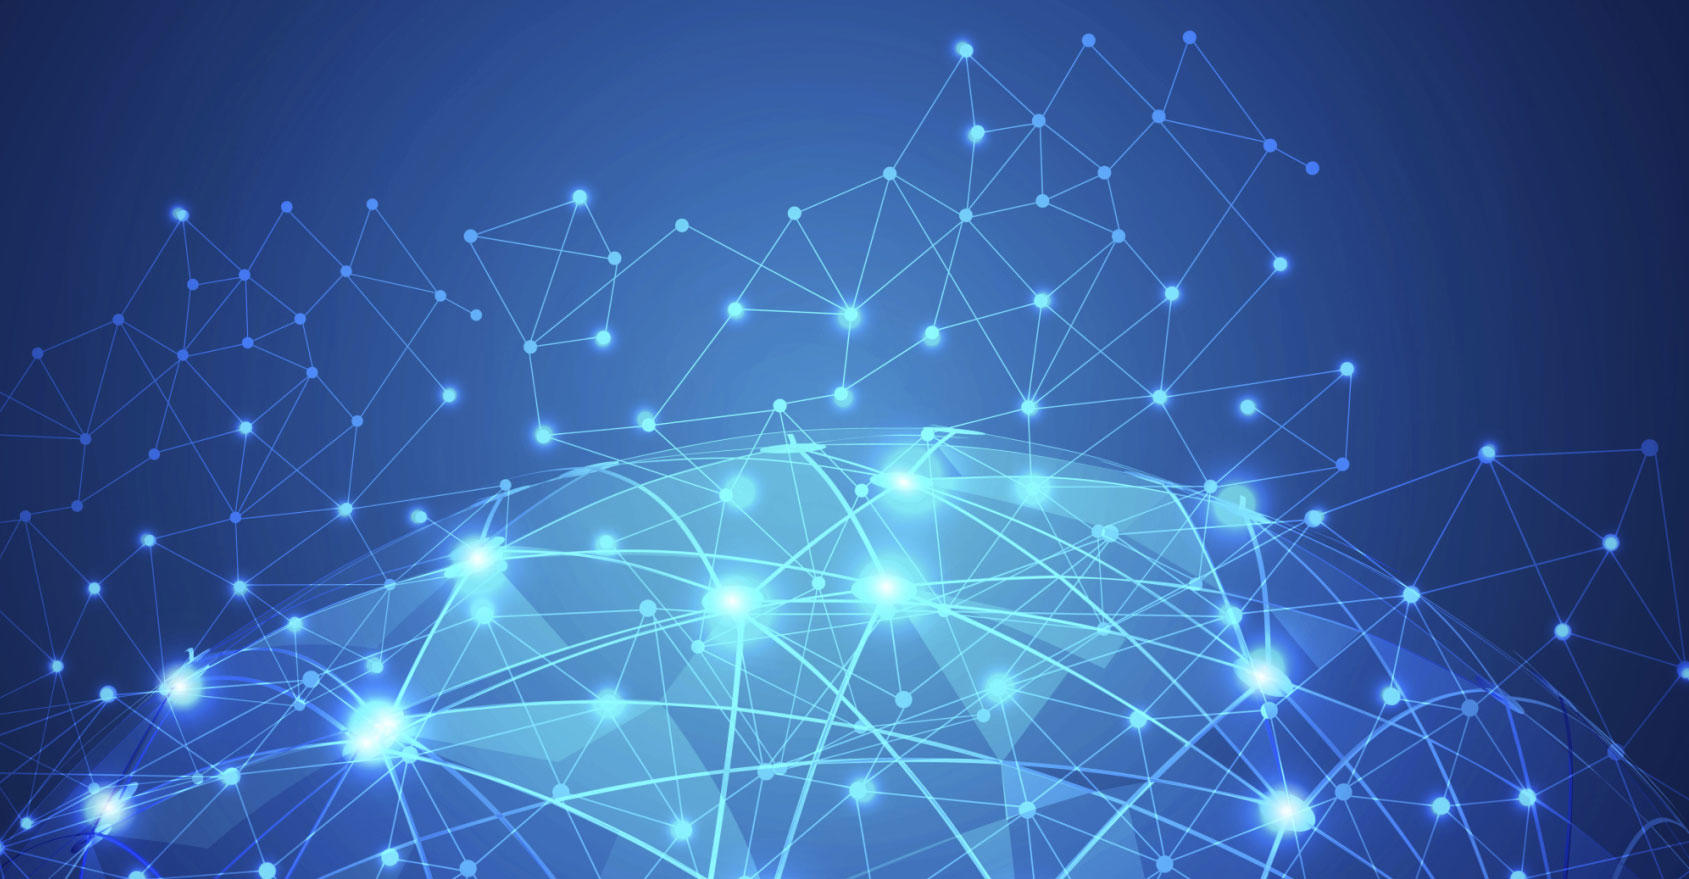 Global Digital mesh network